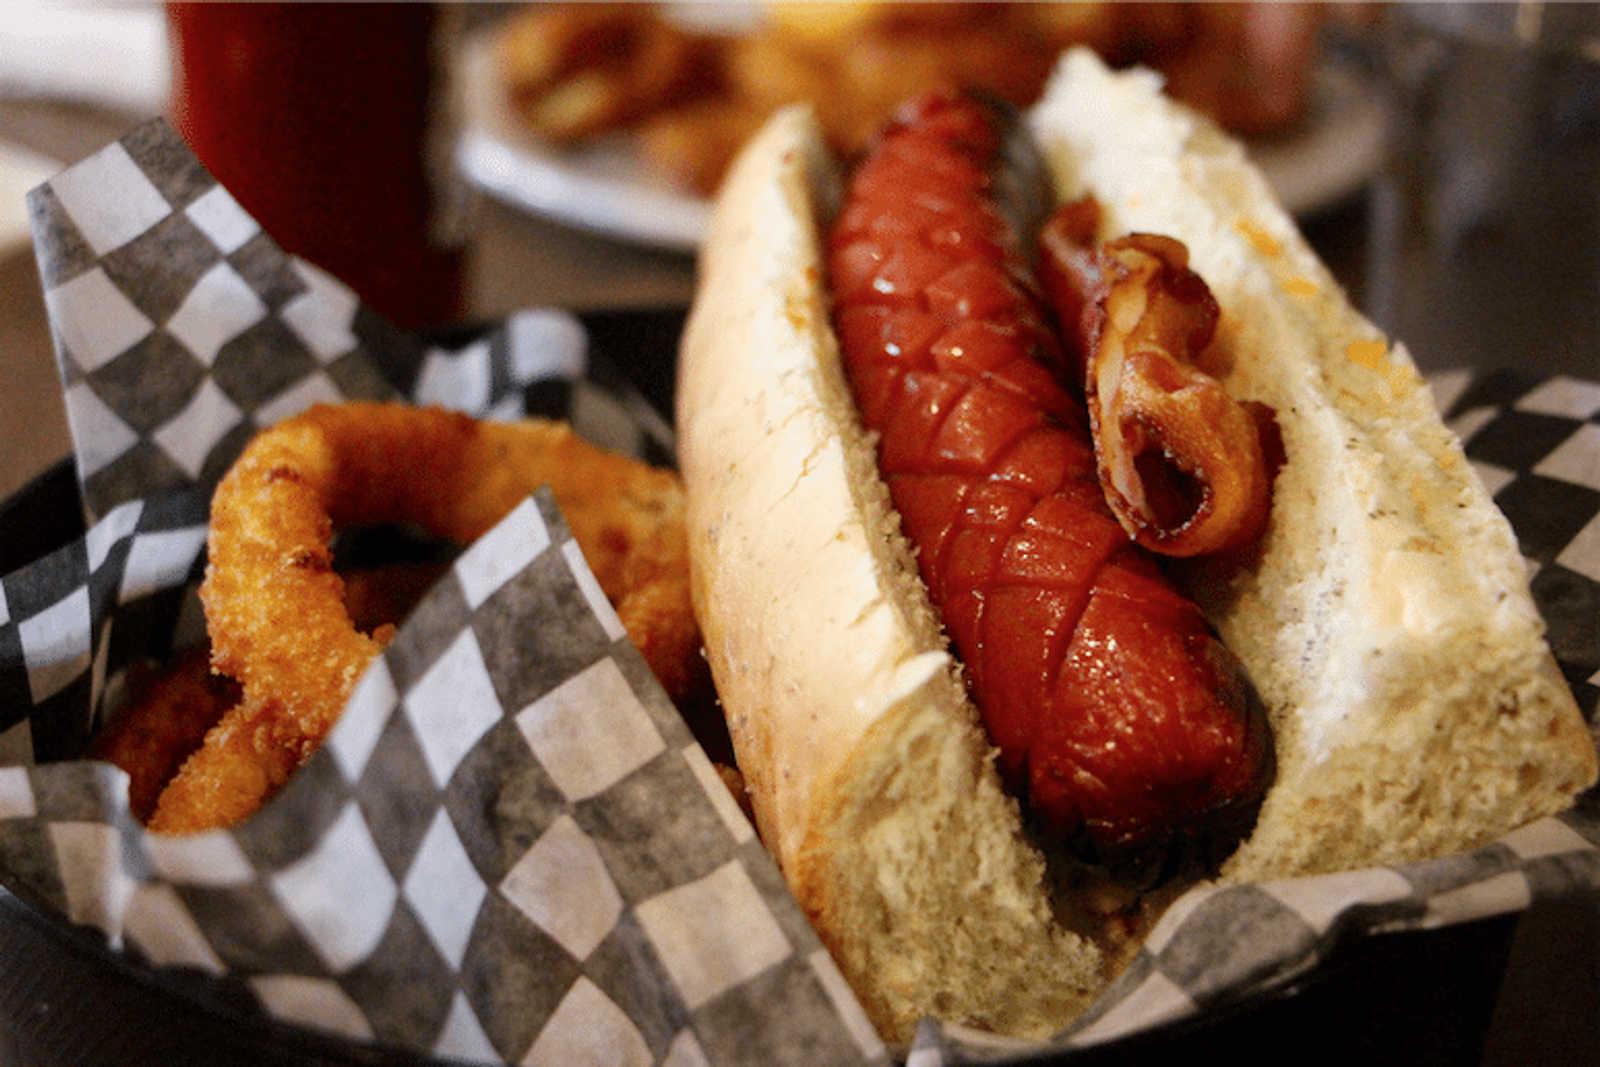 Hot Dog & Onion Rings at Long John's Pub